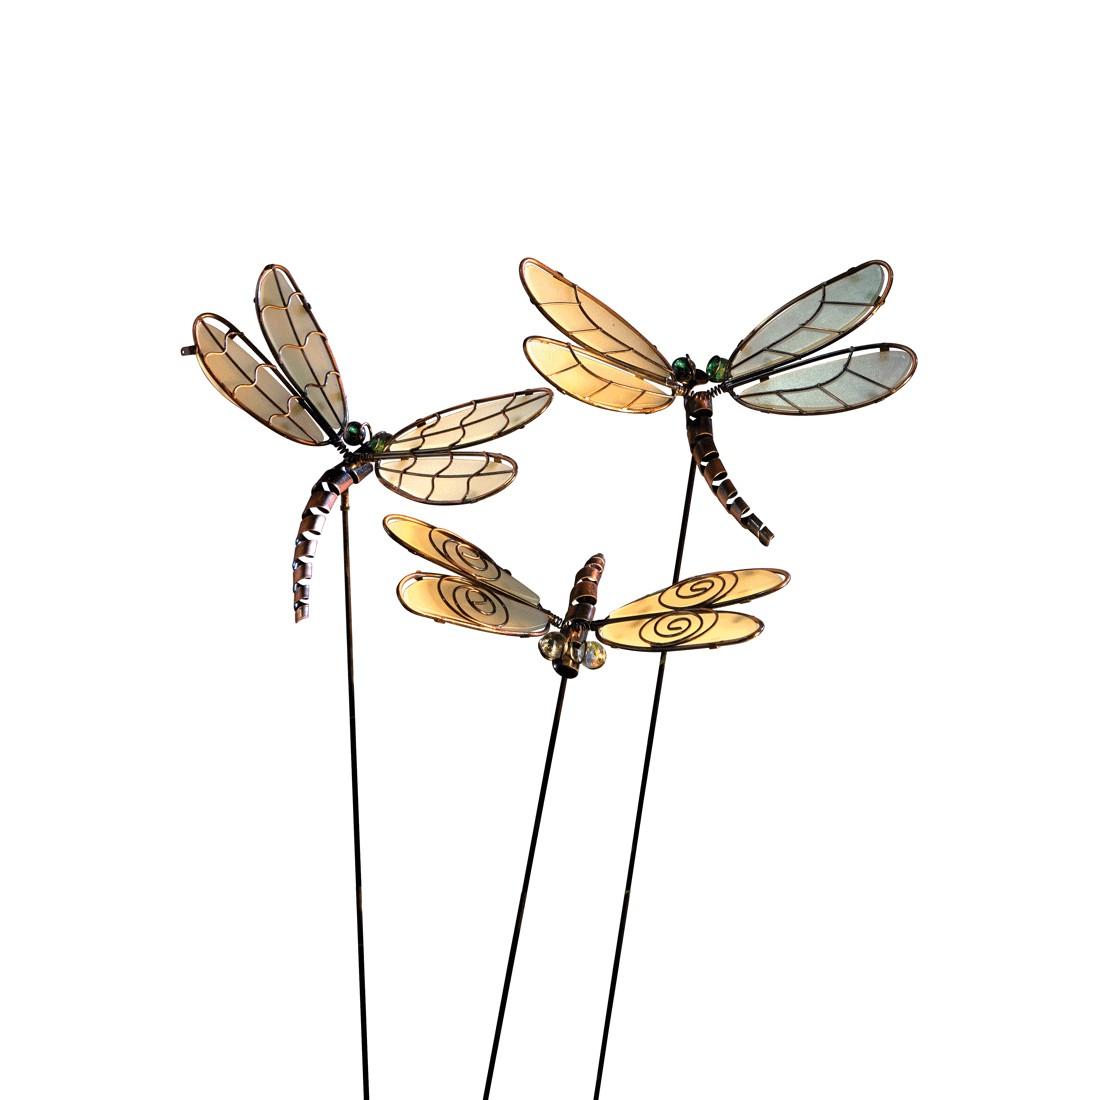 Gartenstecker Libellen 3-teilig – Metall – Braun, PureDay günstig bestellen